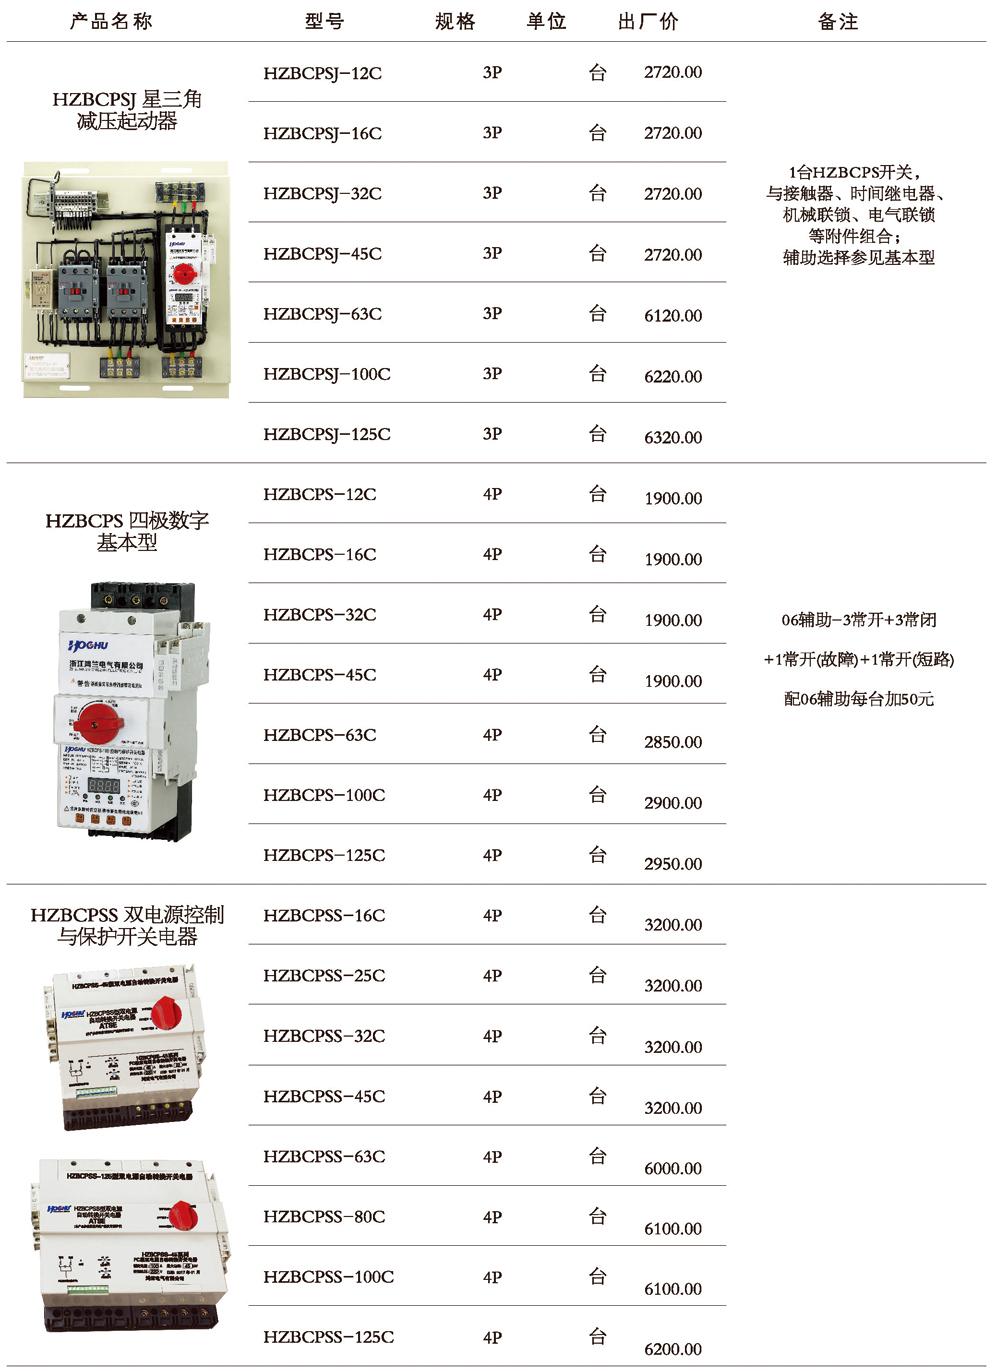 hzbcps产品价格表